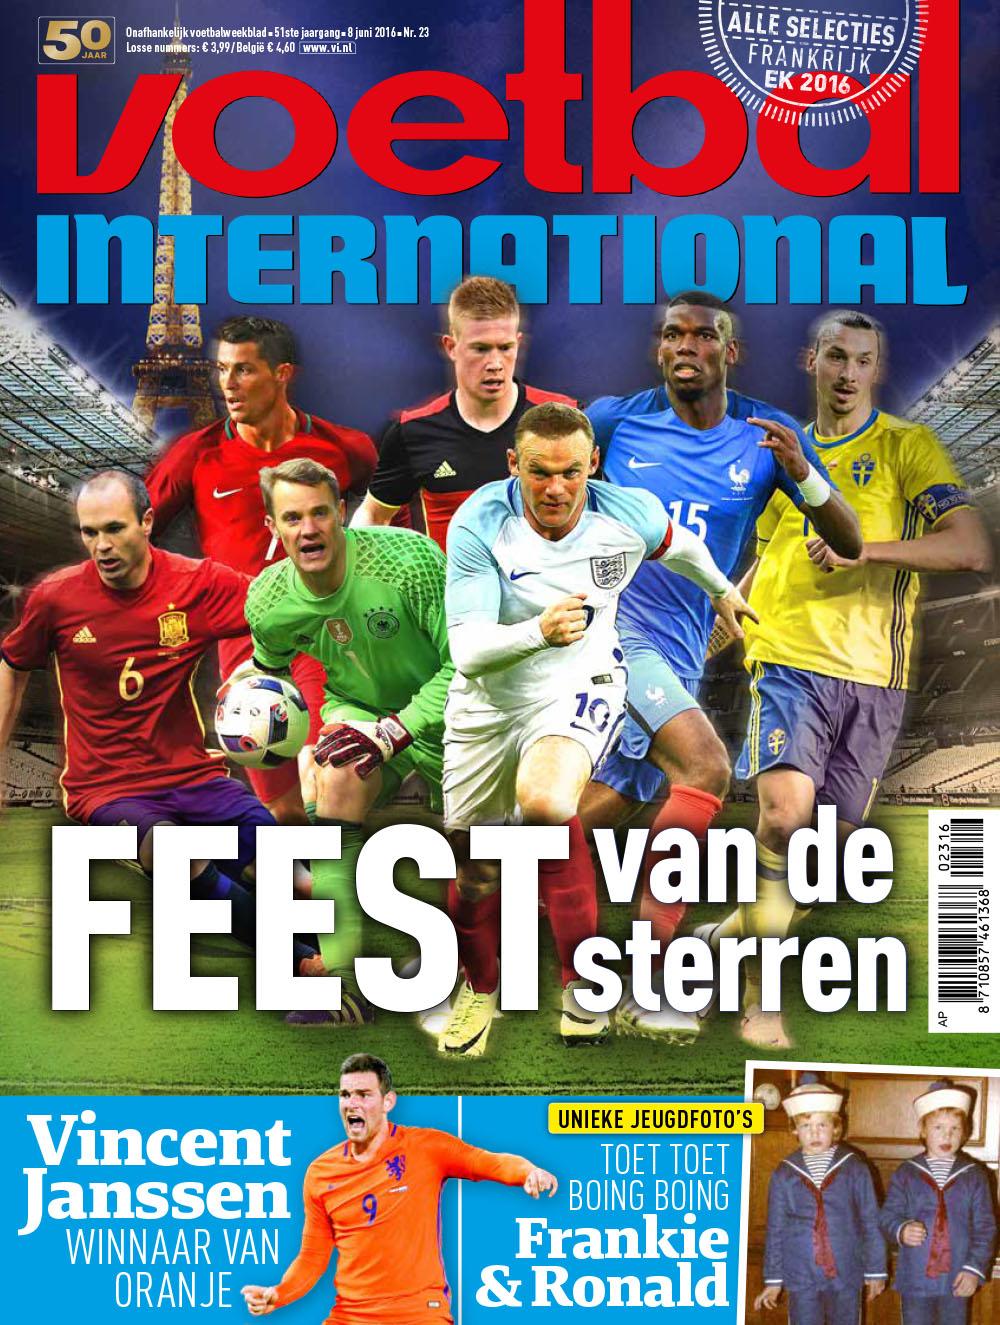 Cover VI 23-2016 - Landelijk